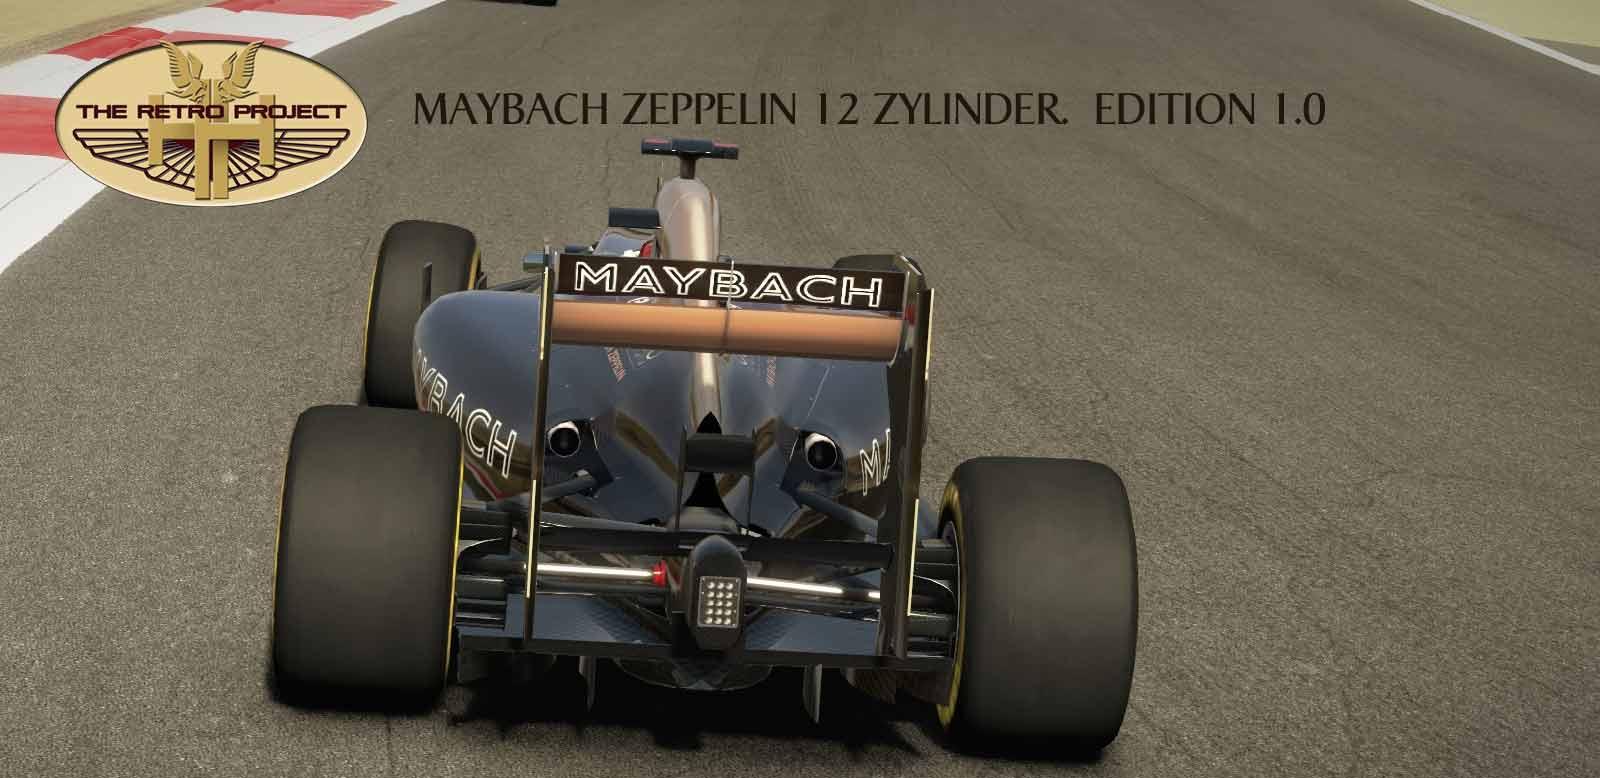 MAYBACH-3.jpg